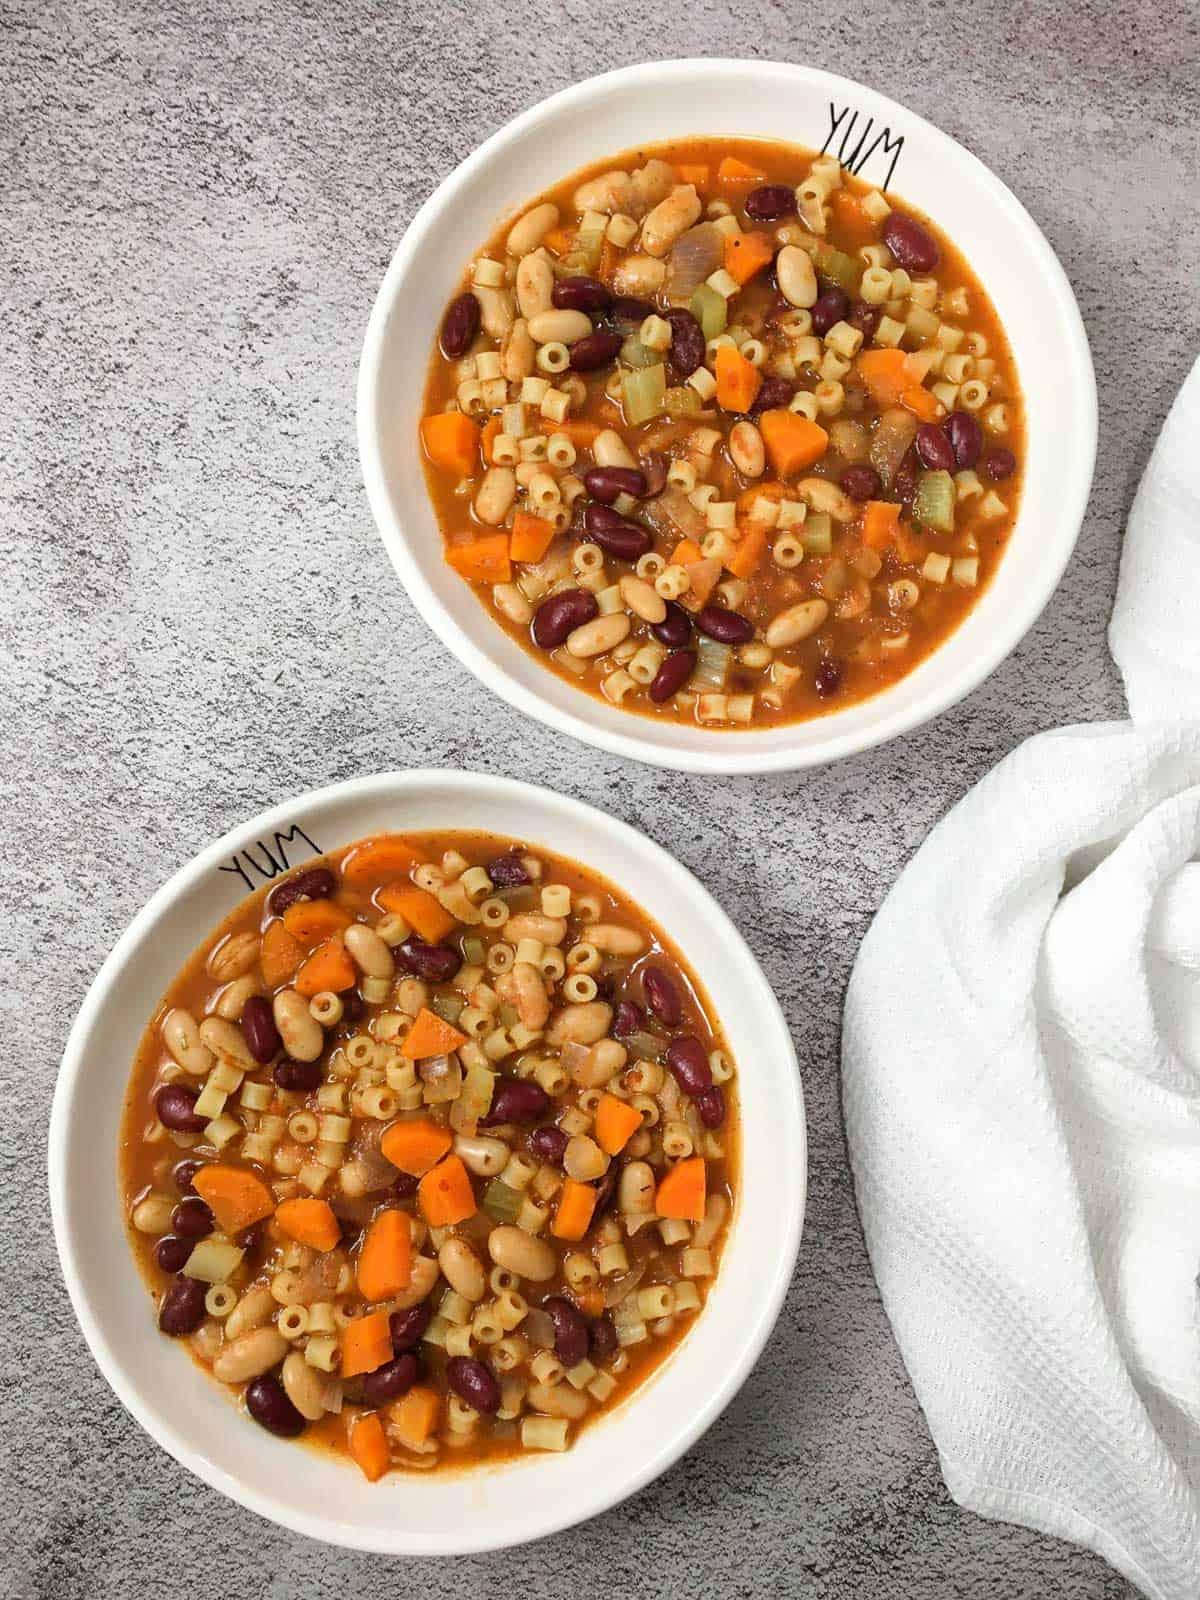 Two bowls of vegan pasta e fagioli on concrete surface.